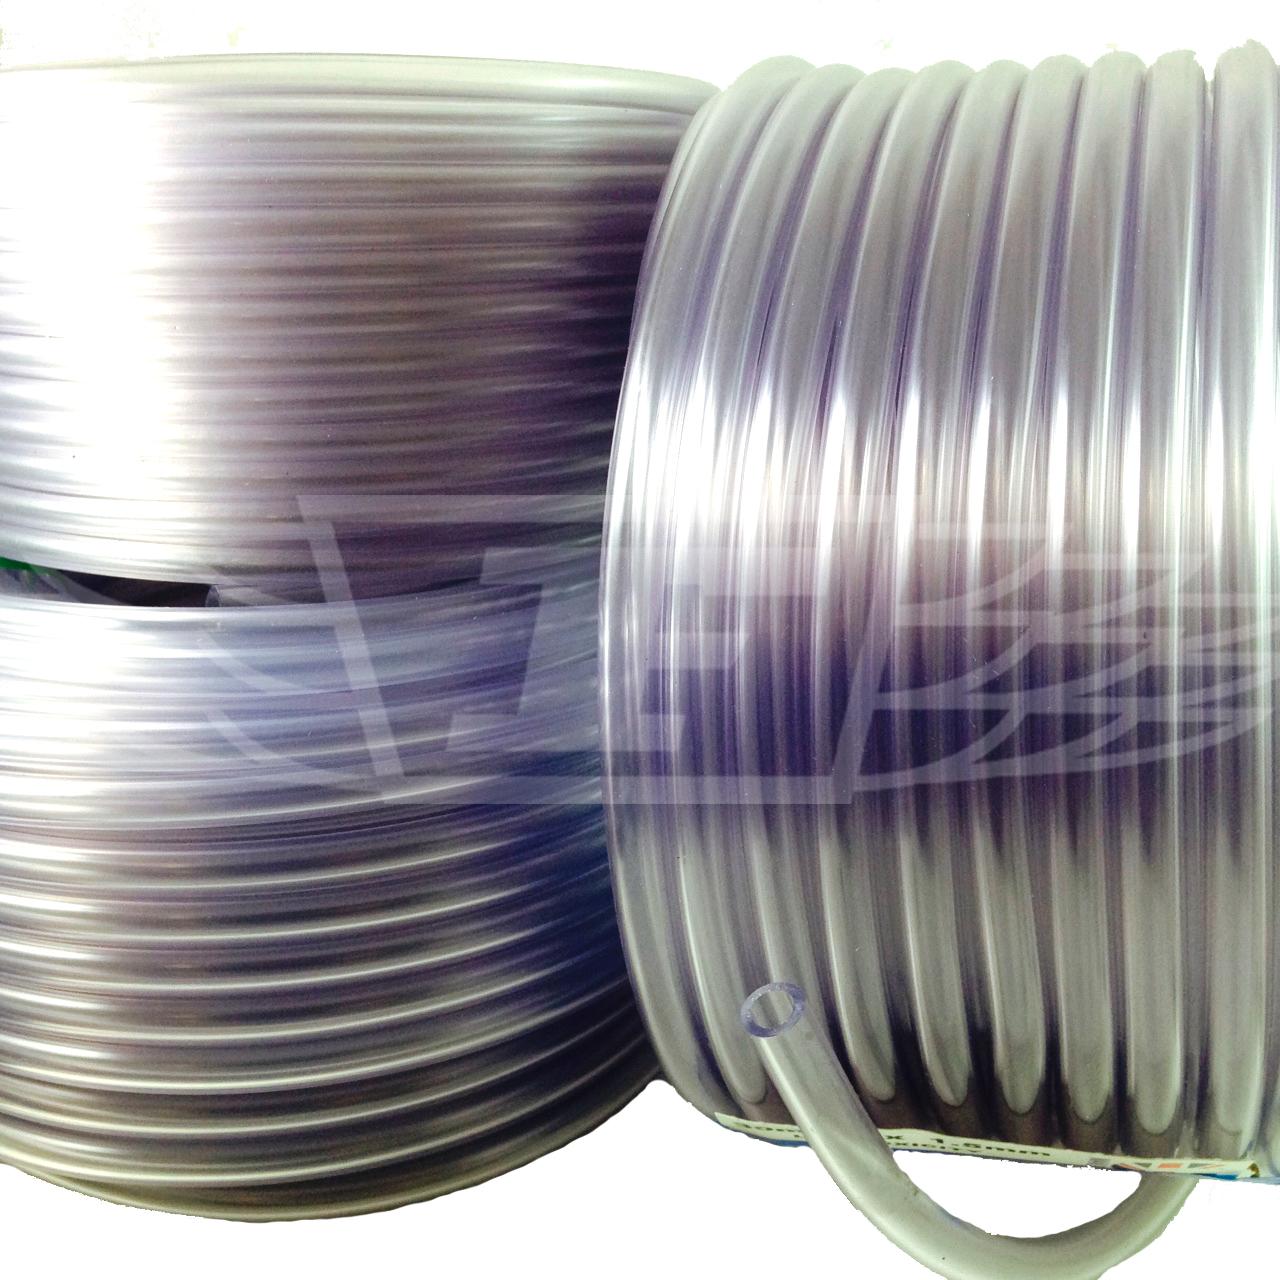 3 8 clear pvc tubing plastic flexible water hose pipe screen tube food. Black Bedroom Furniture Sets. Home Design Ideas